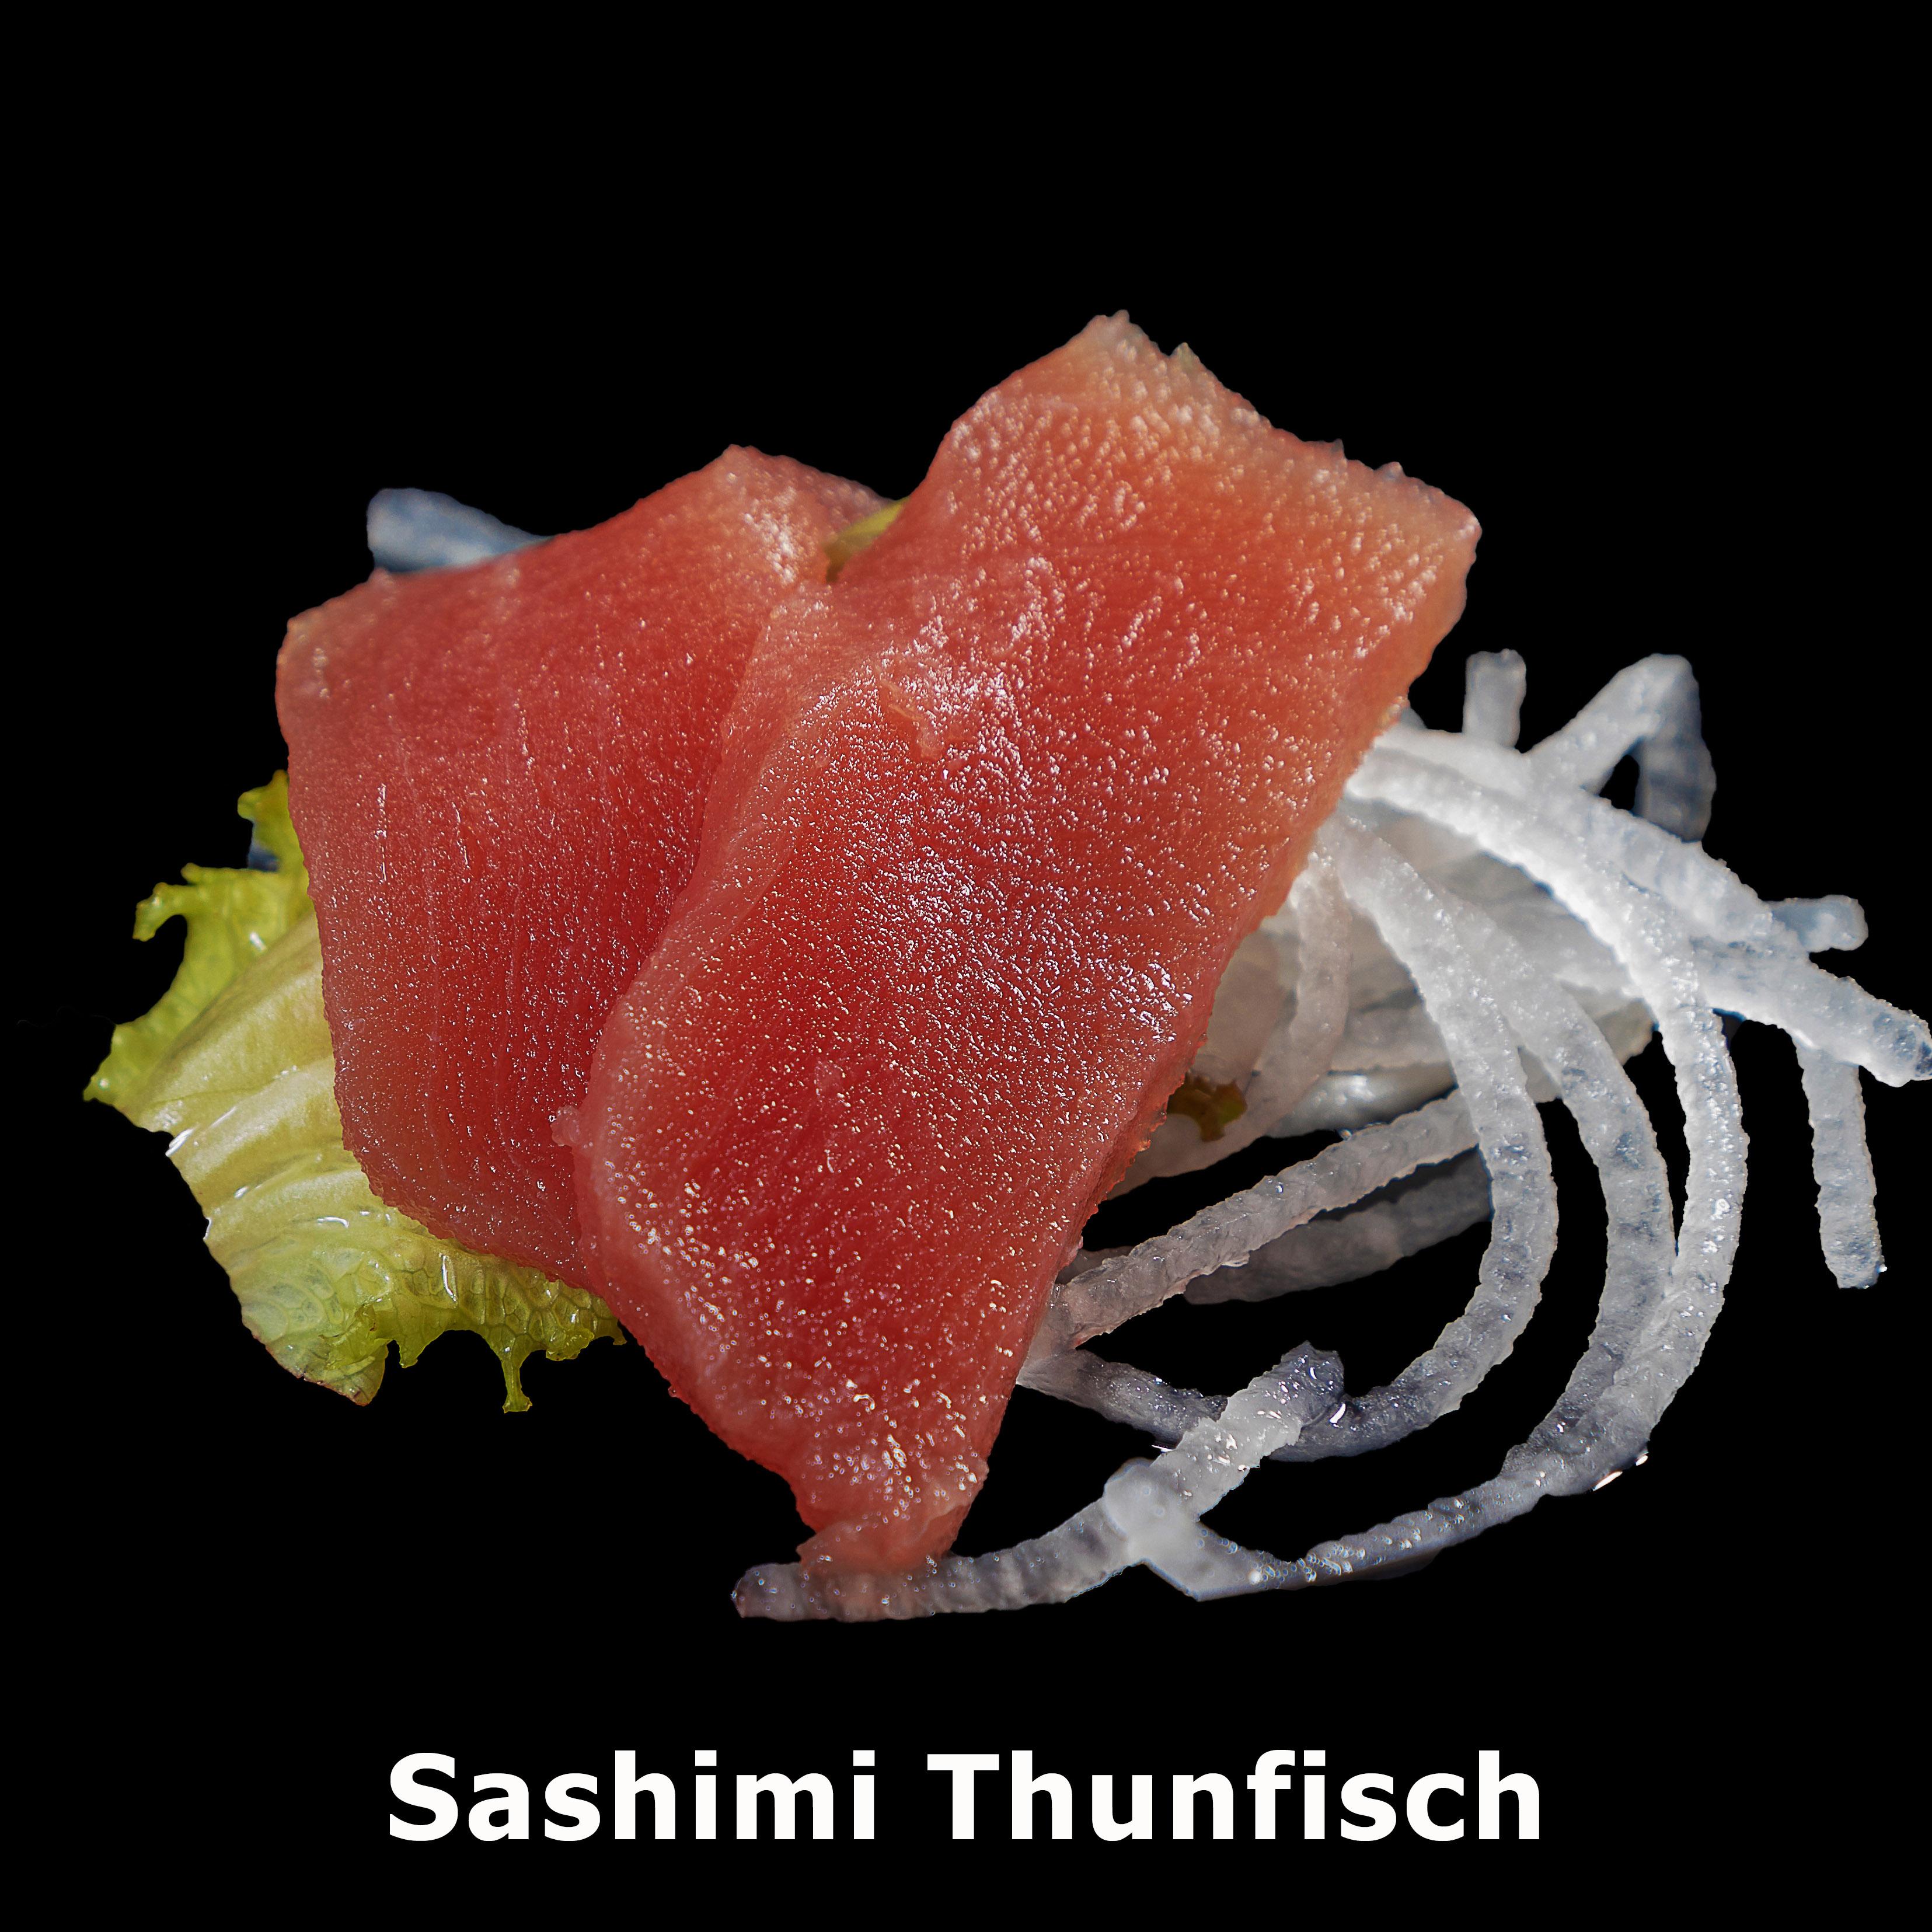 70. Sashimi Thunfisch